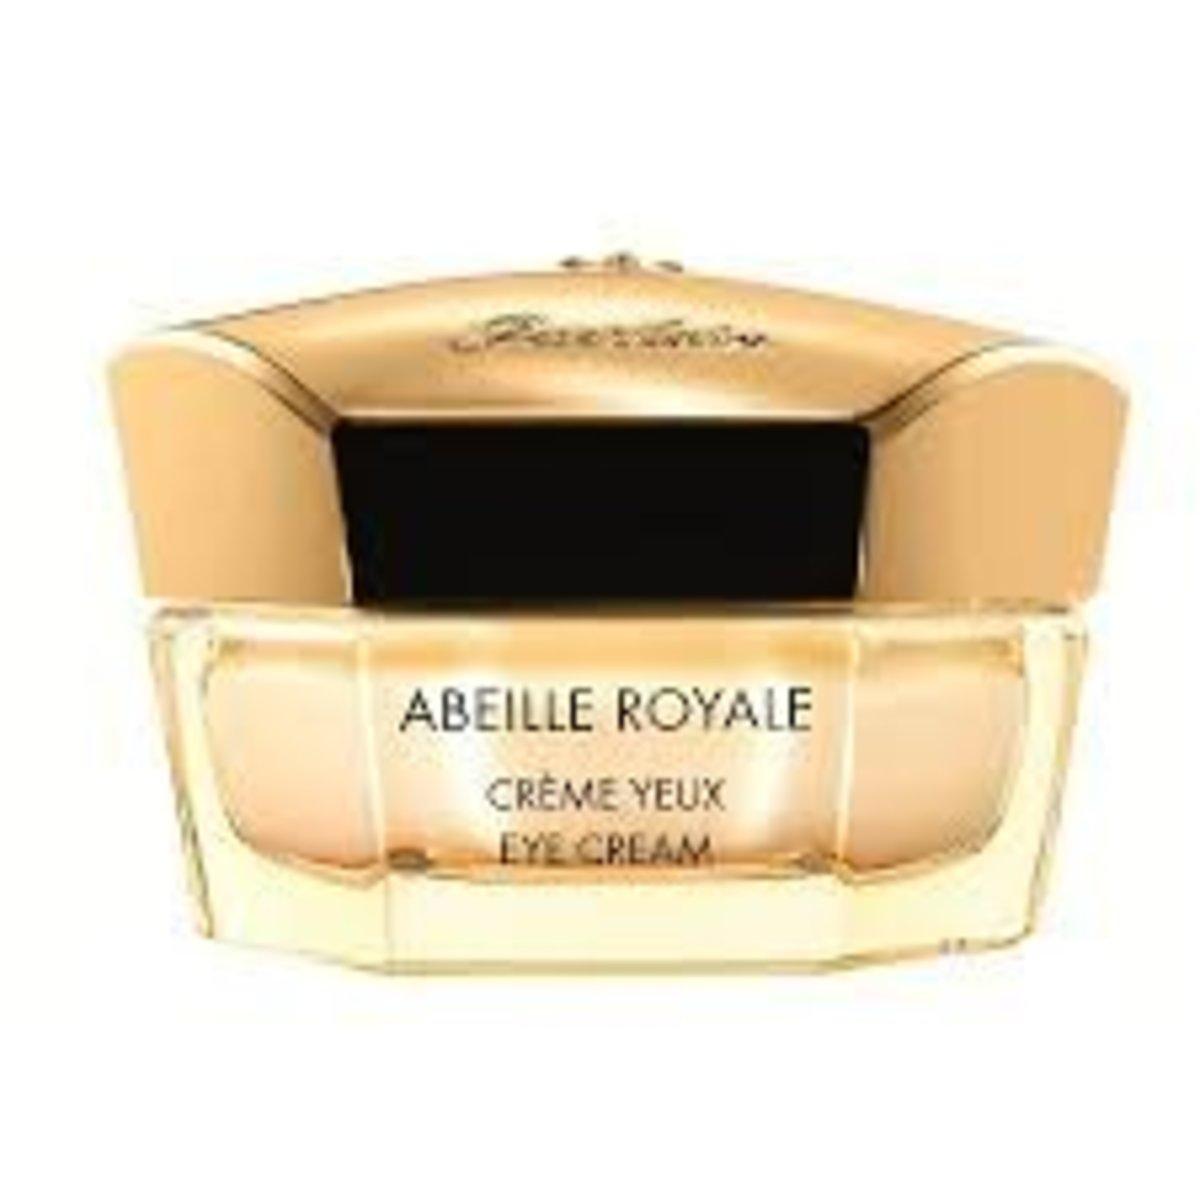 Abeille Royale Eye Cream 15ml (3346470612754)(Parallel Import goods)